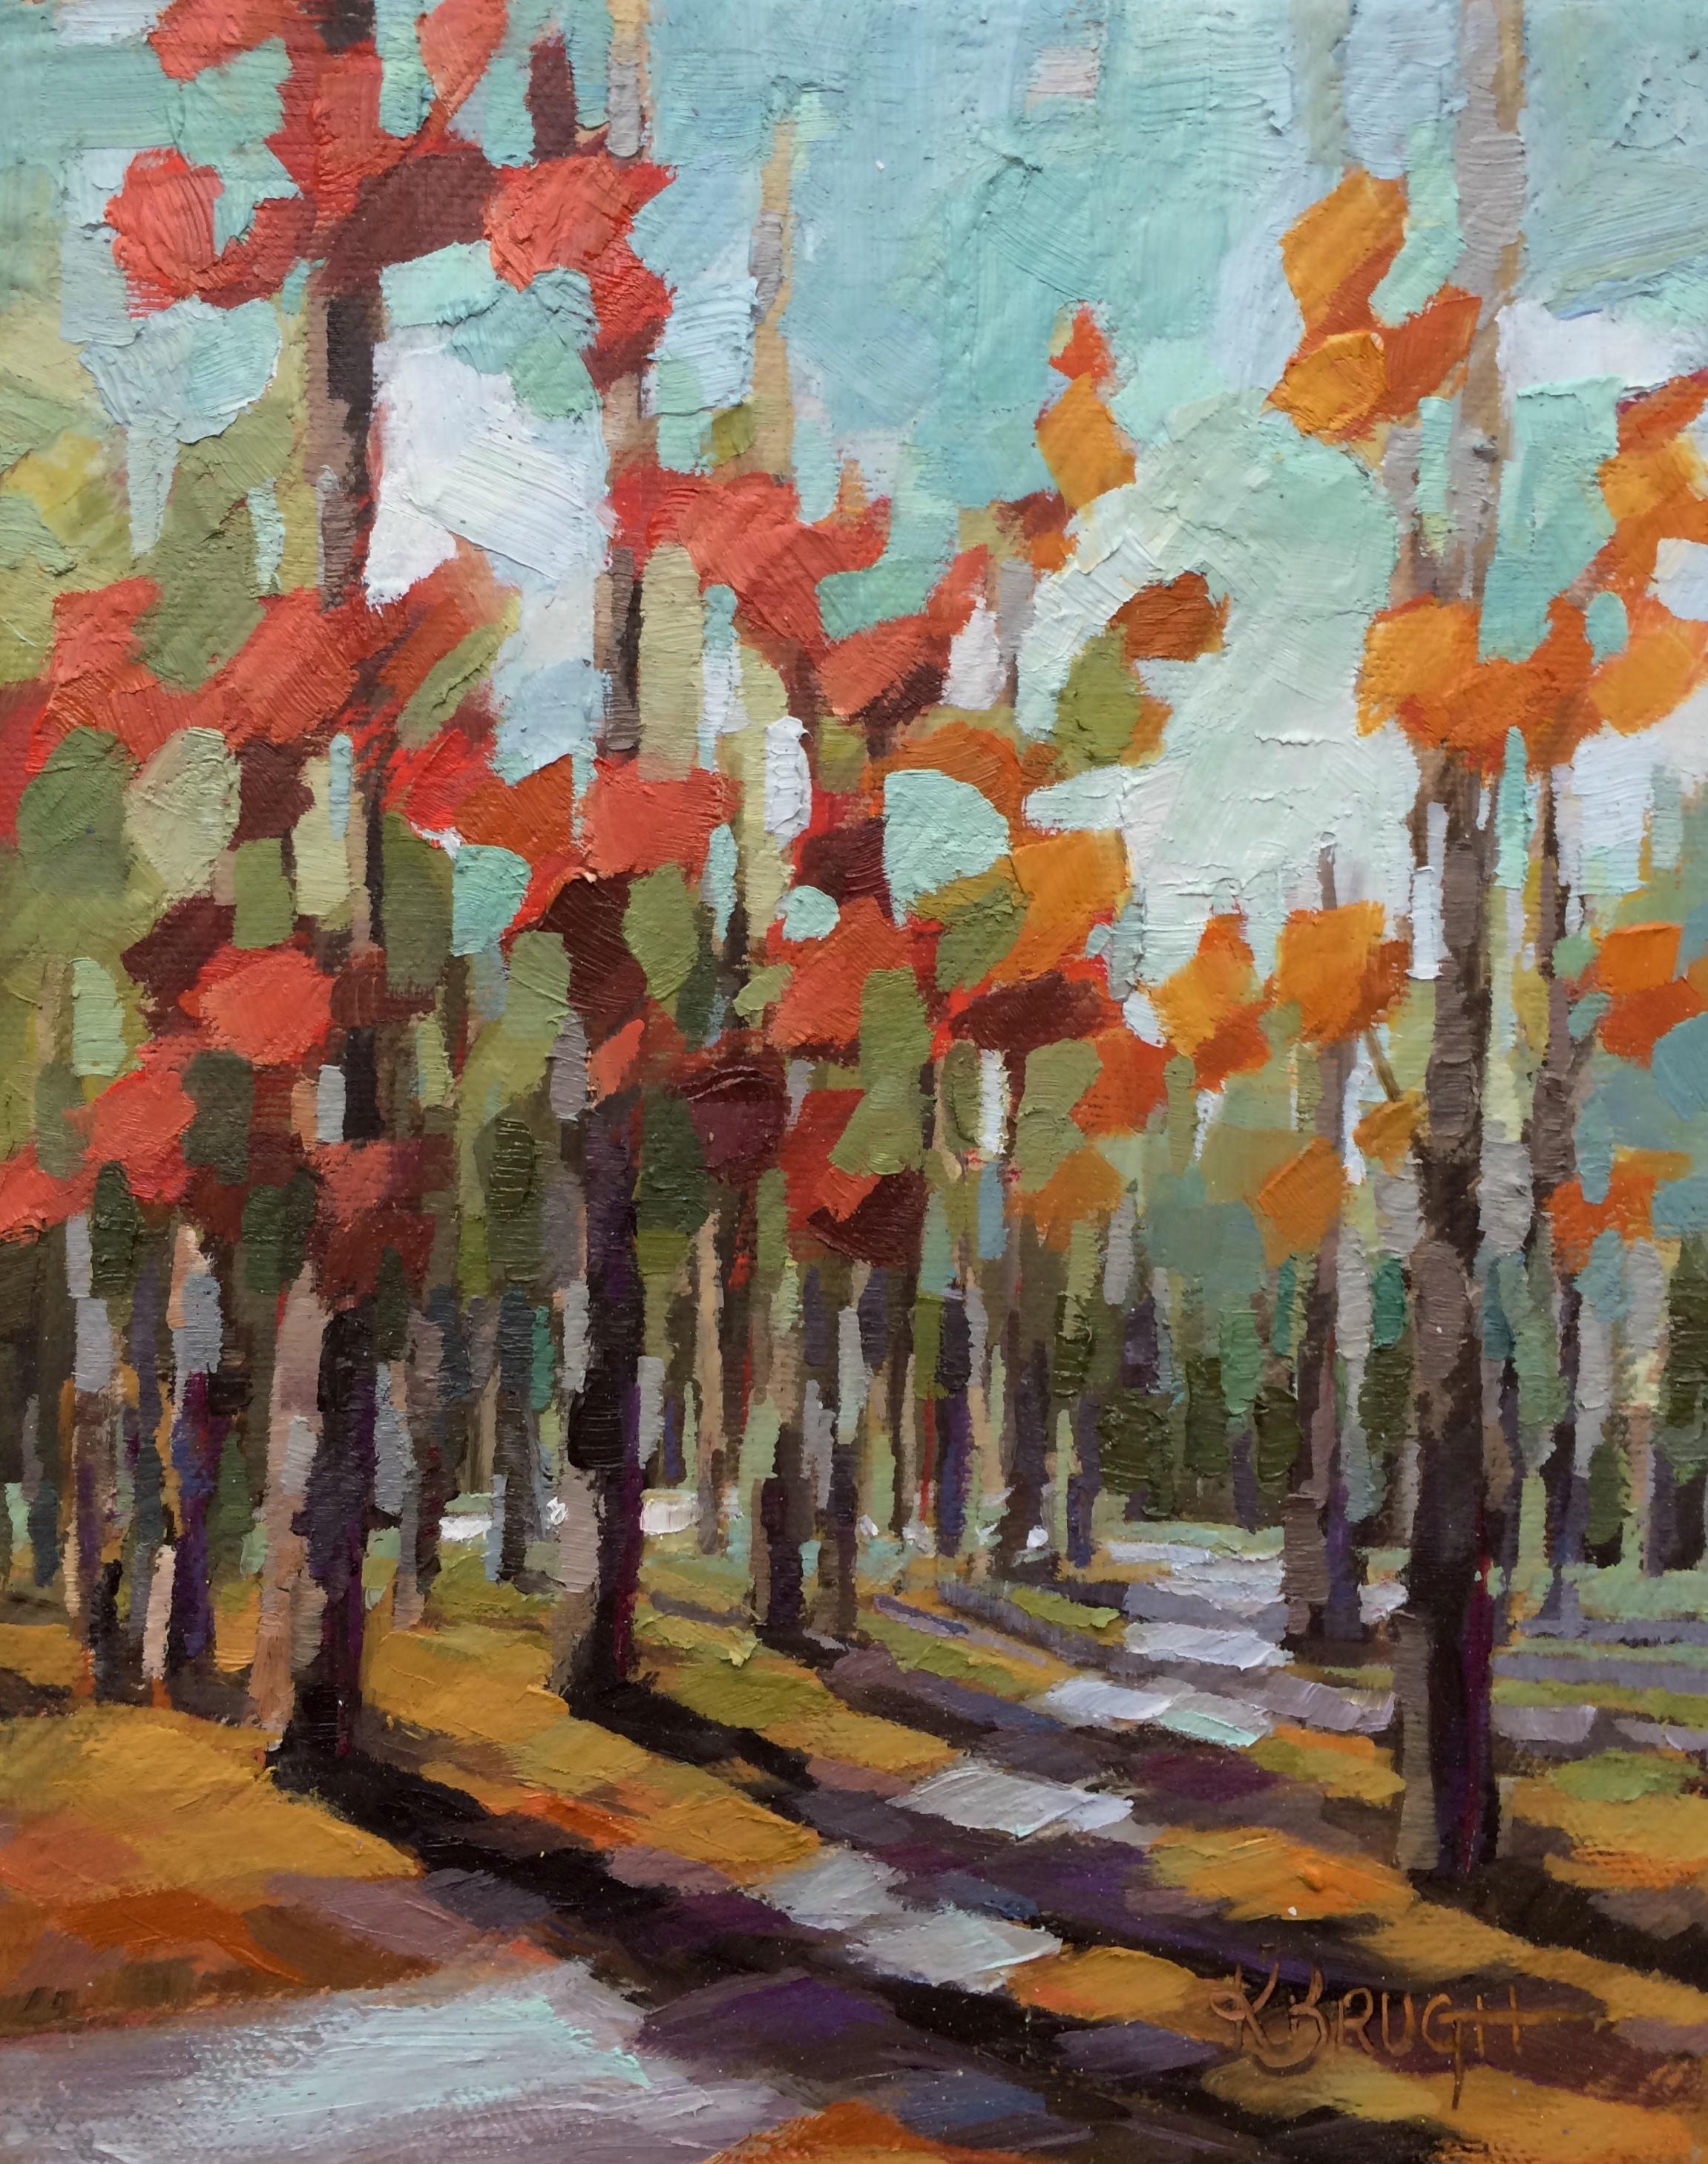 Kelley Brugh_Autumn at Freedom Park_8x10, Oil on canvas.jpg